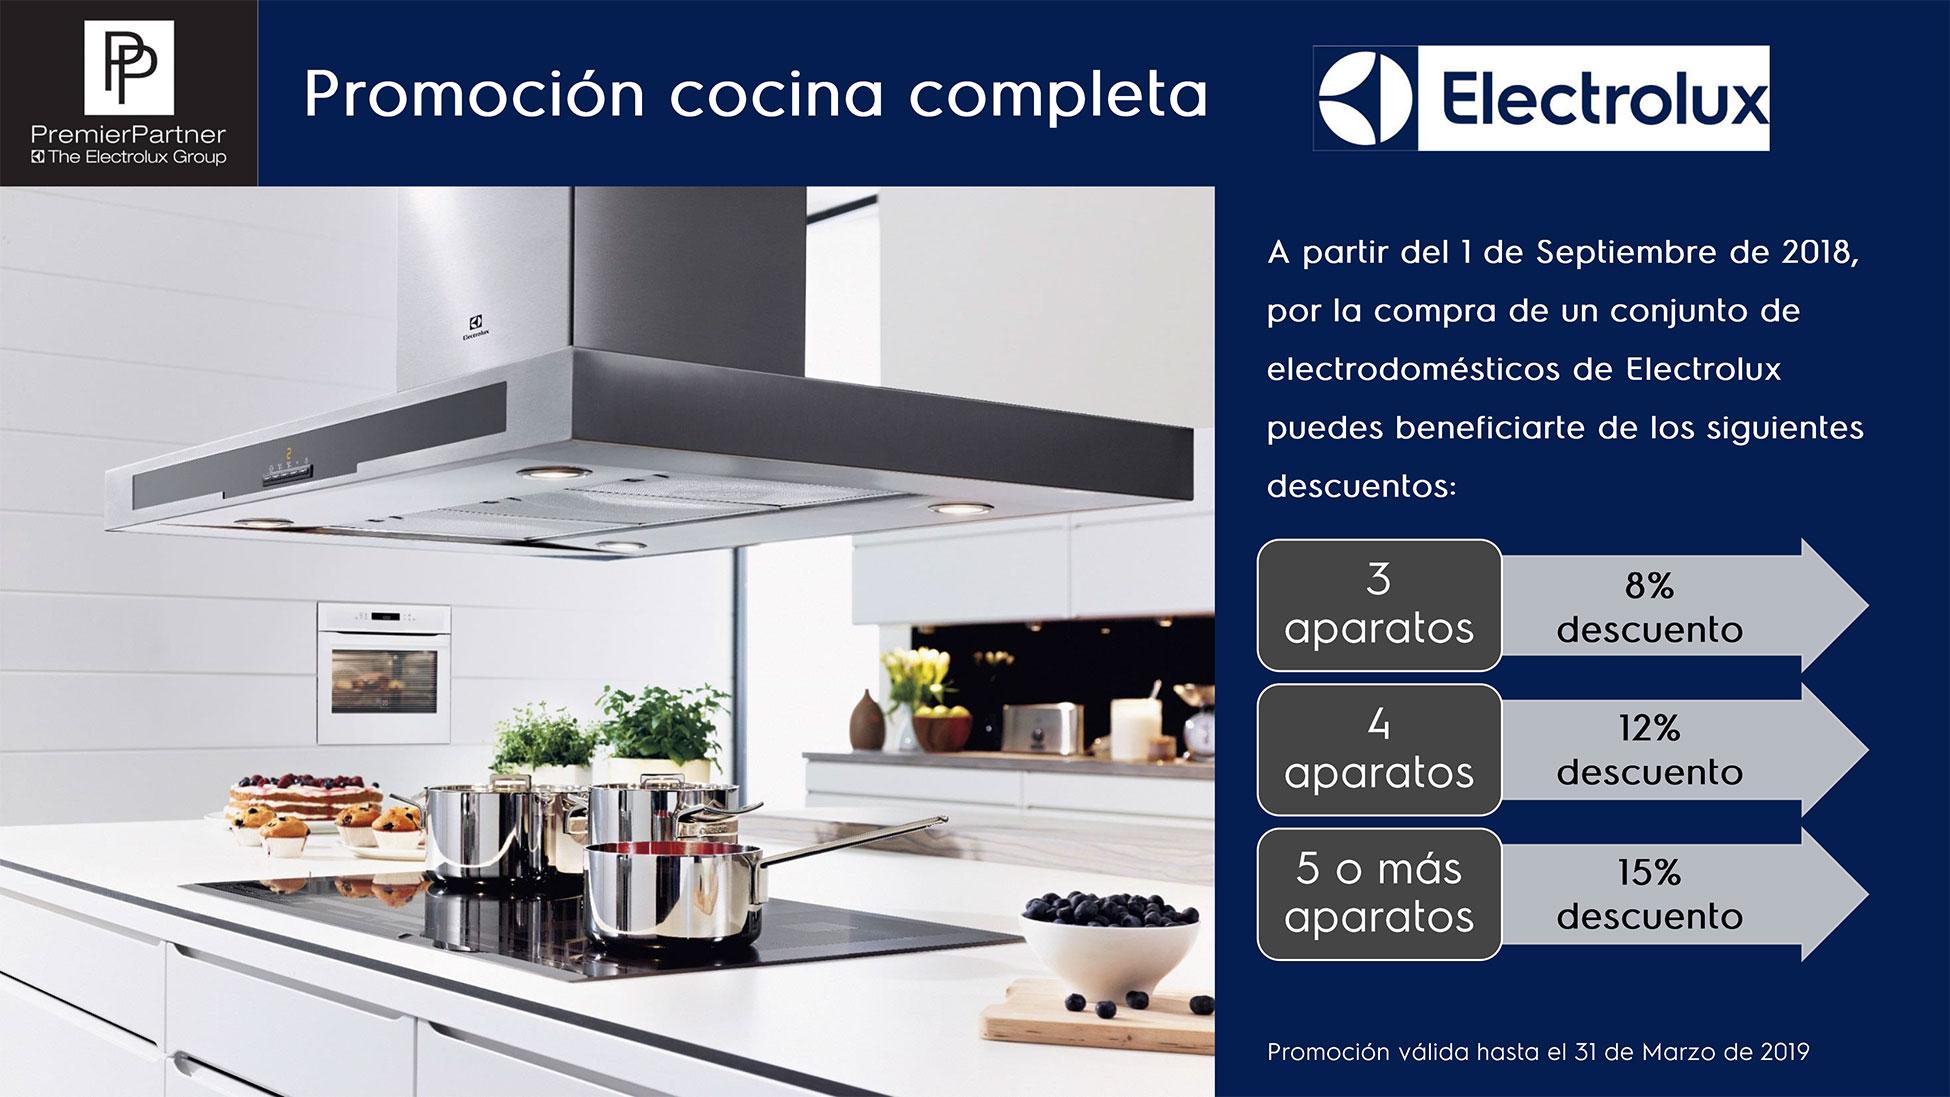 promocion-cocina-completa-premier-partner-electrolux